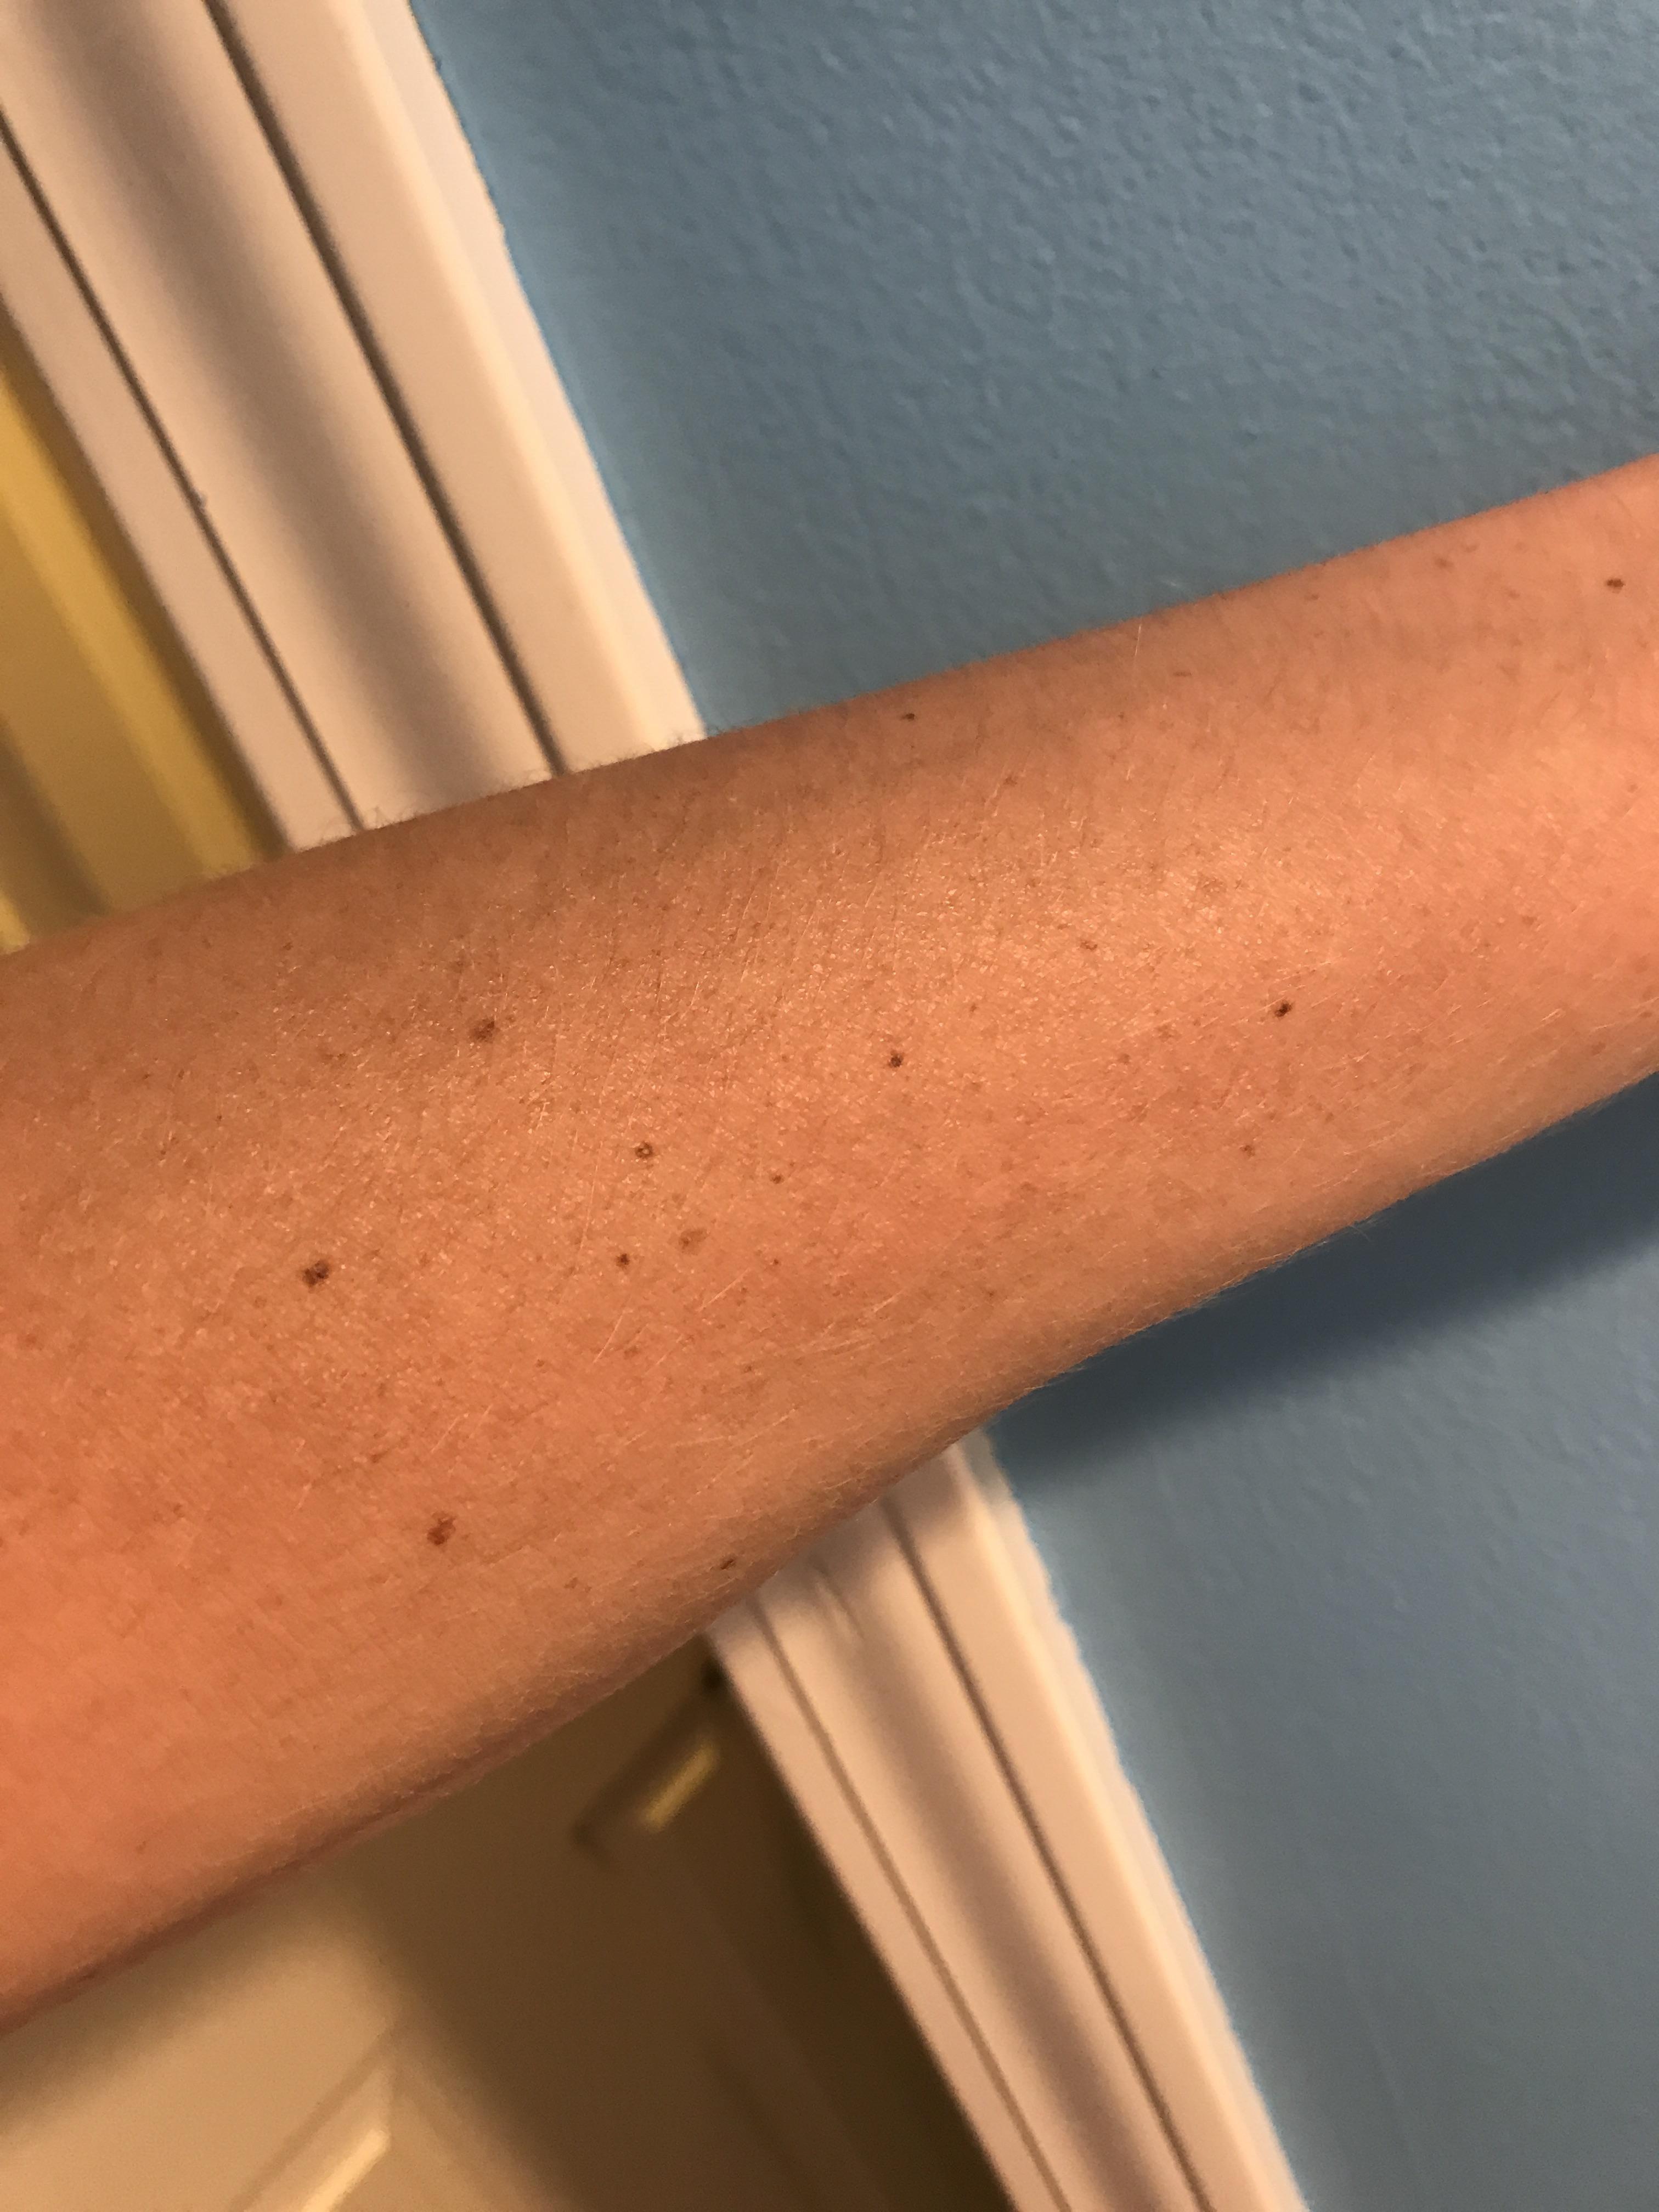 The Big Dipper in freckles on my arm : mildlyinteresting